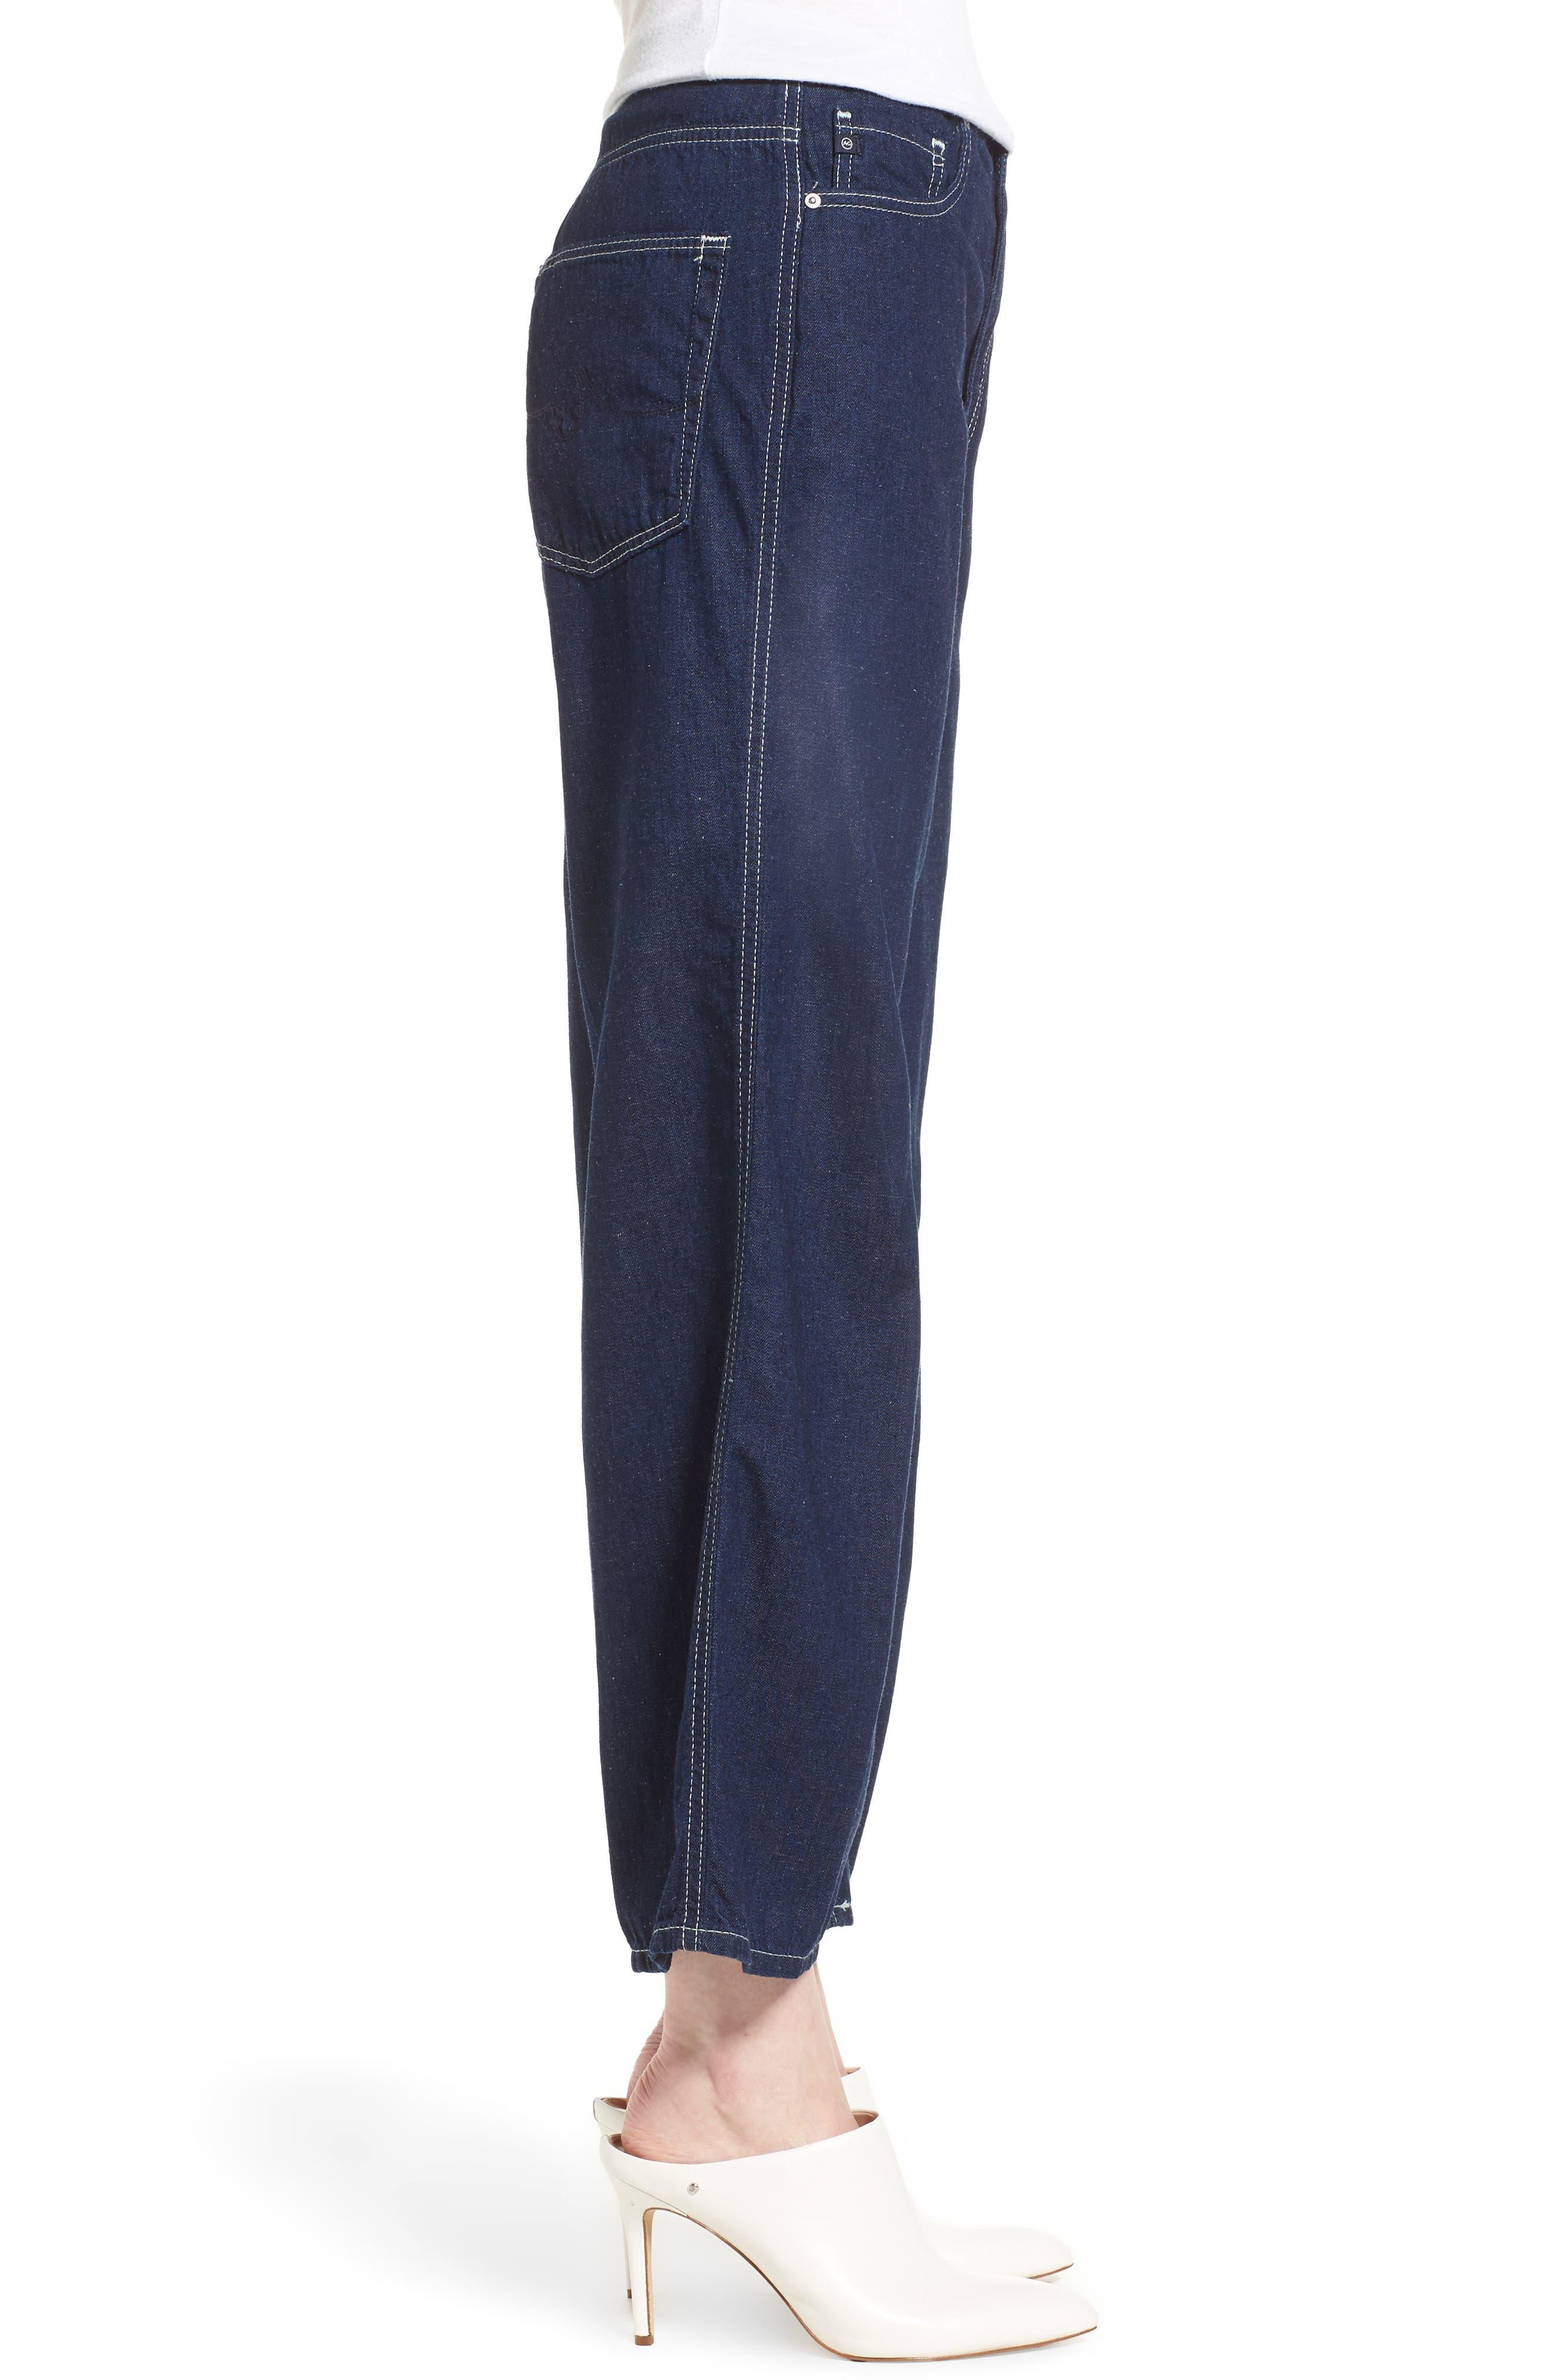 Etta High Waist Crop Wide Leg Jeans,                             Alternate thumbnail 3, color,                             496